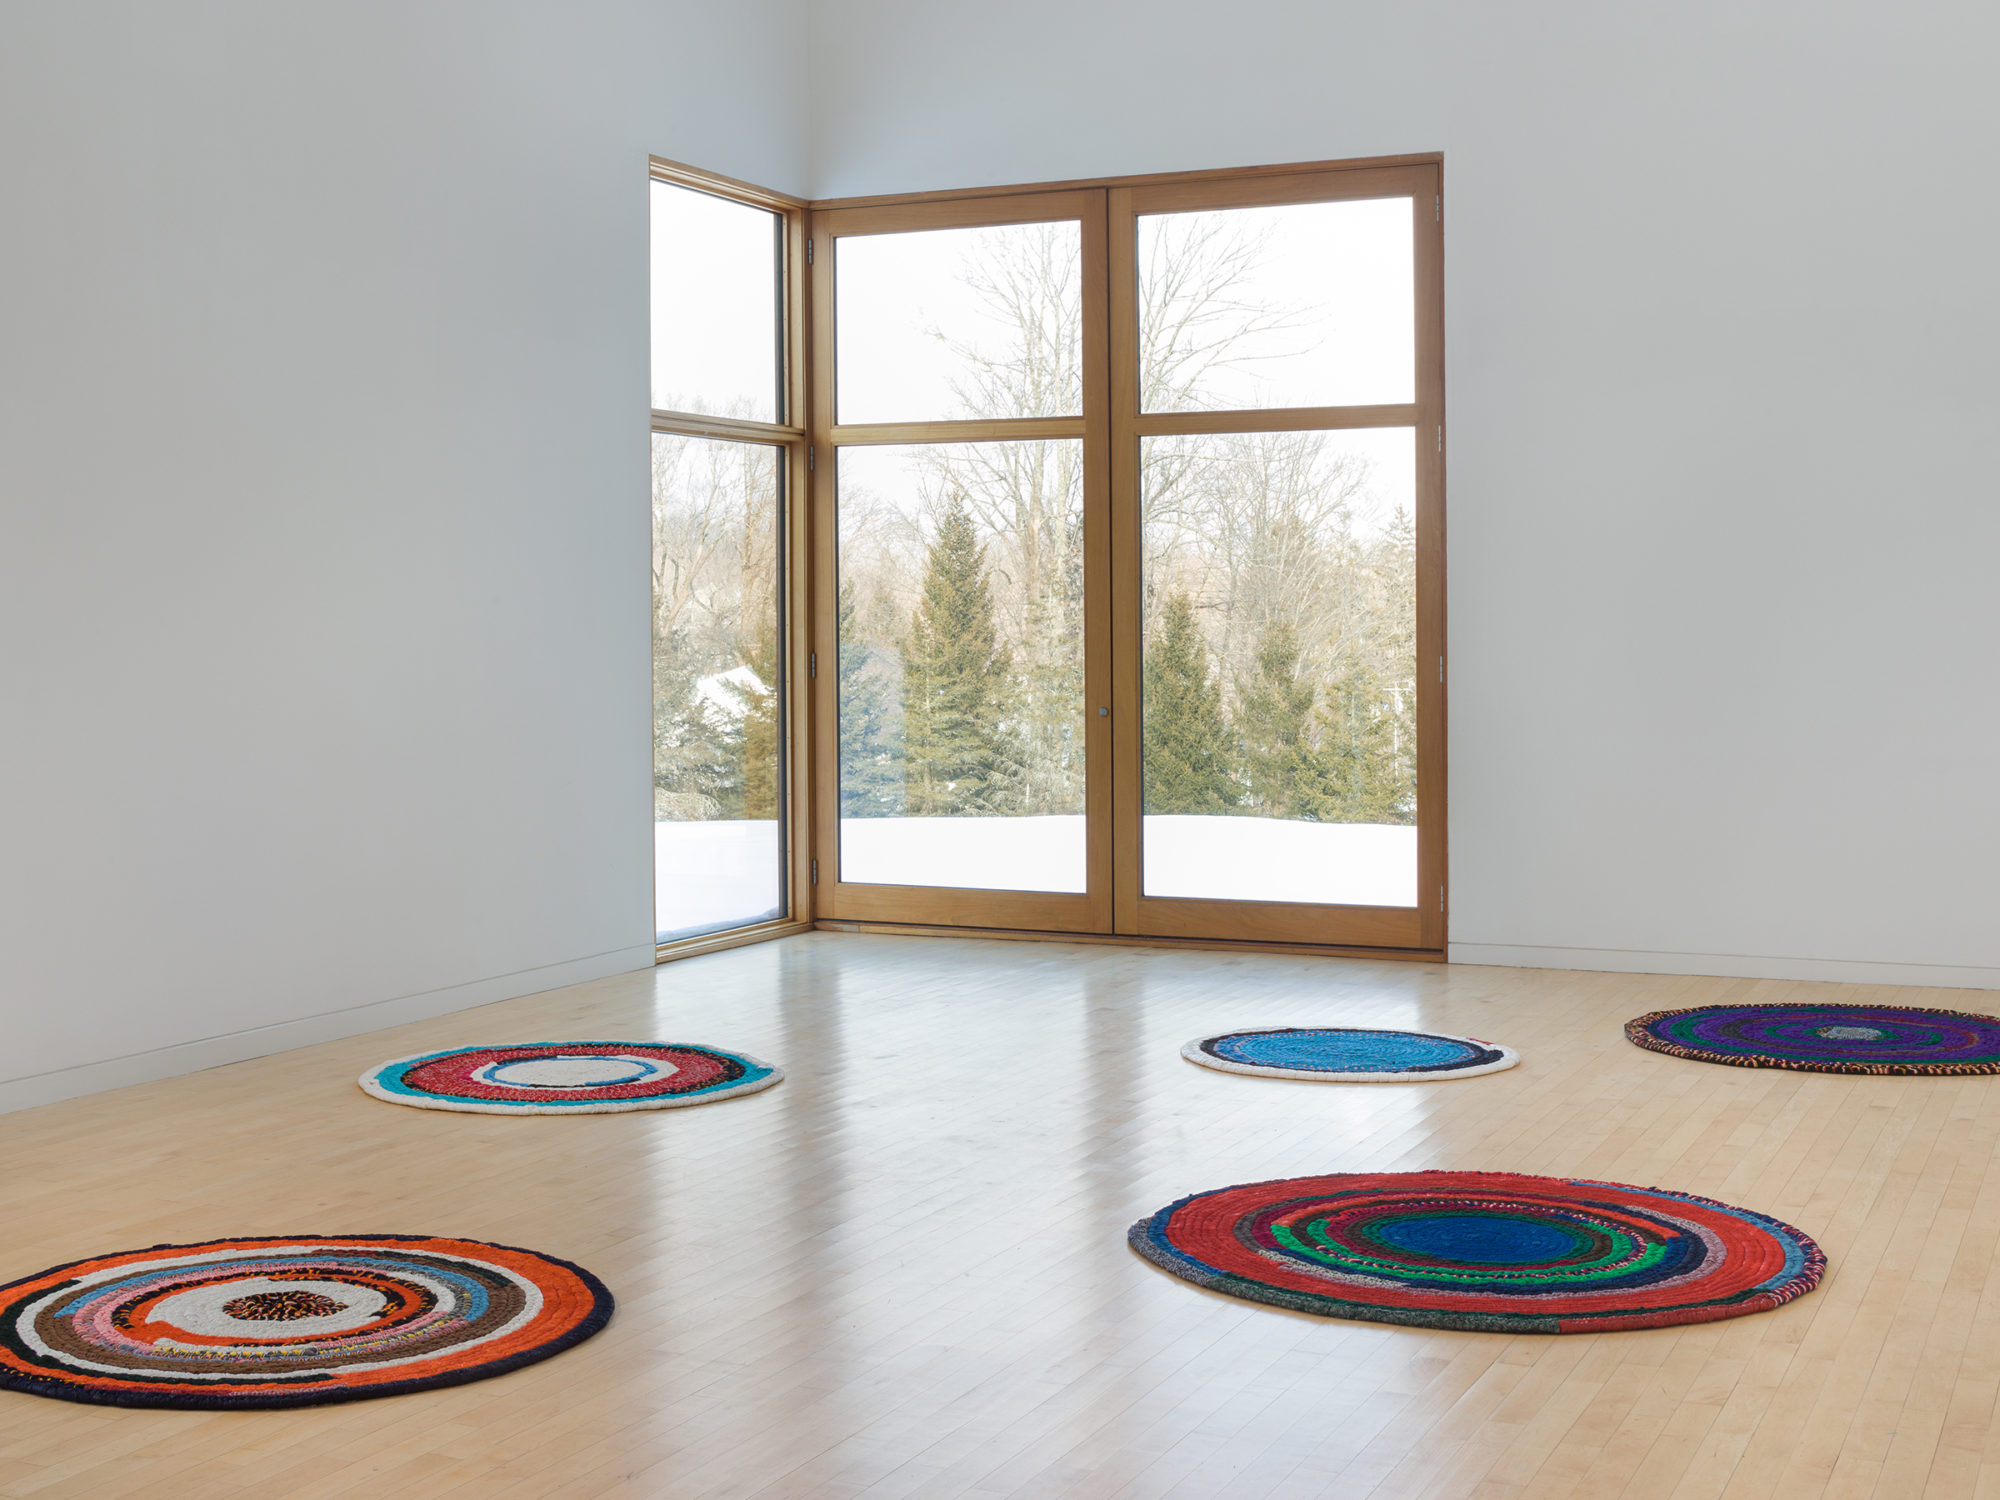 Harmony Hammond's Floorpieces at The Aldrich Contemporary Art Museum